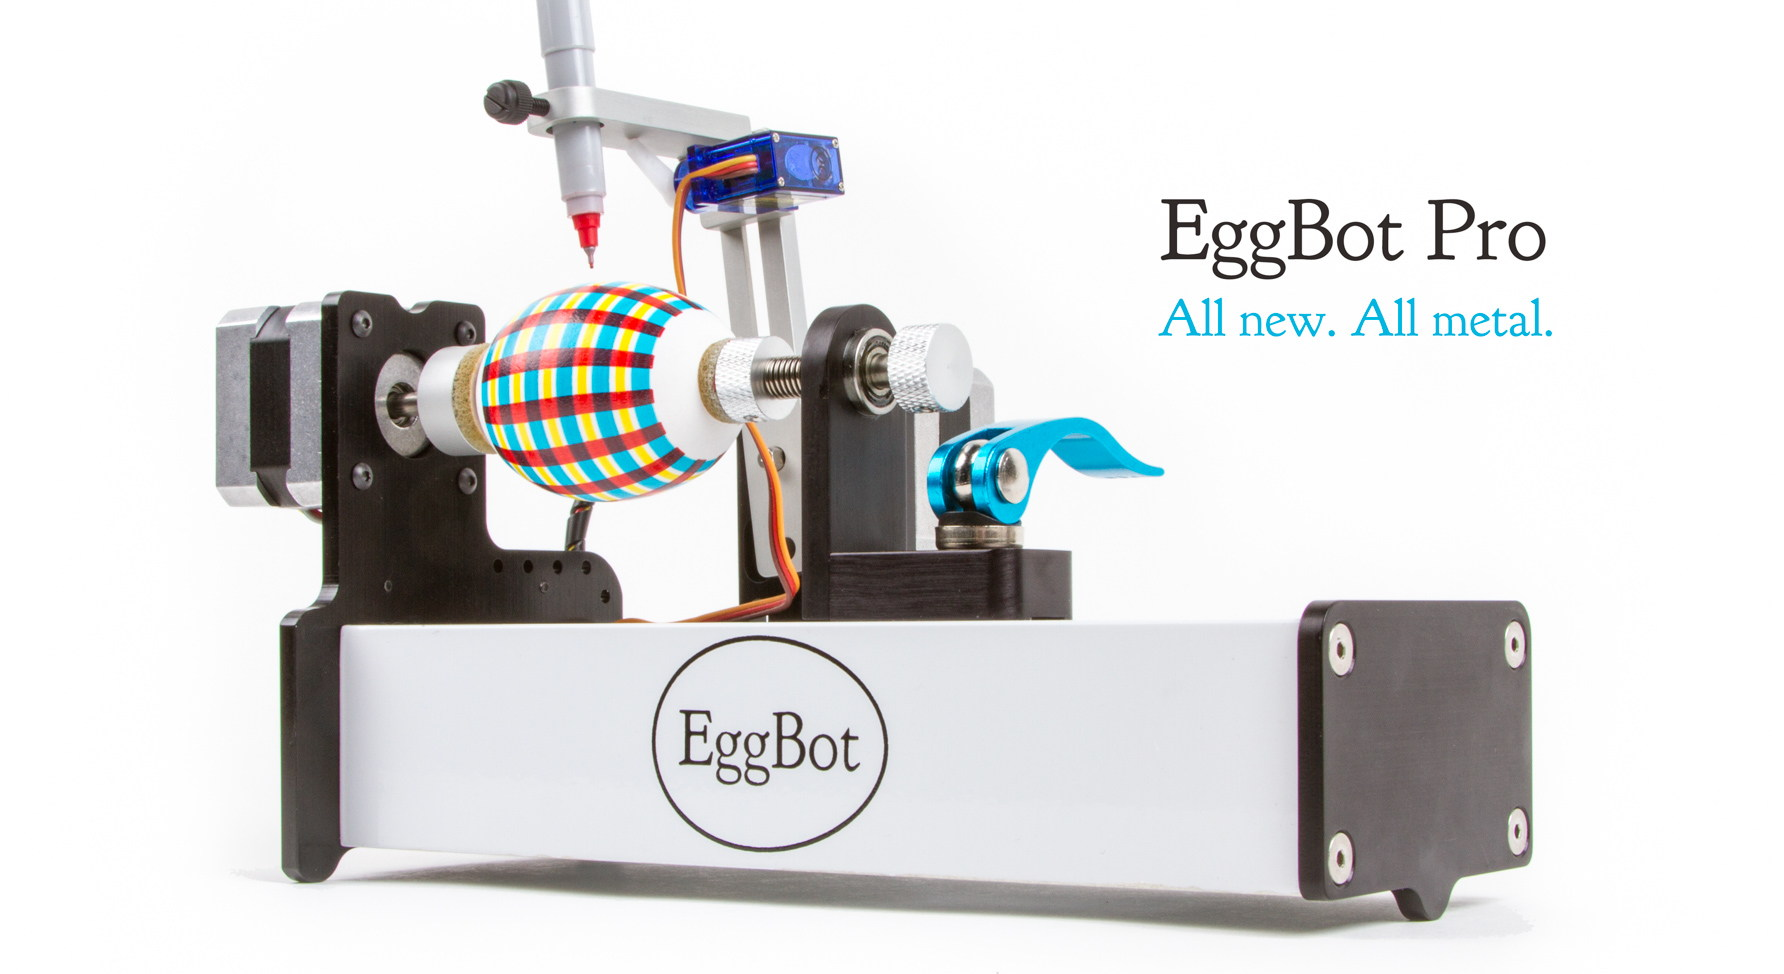 EggBot Pro